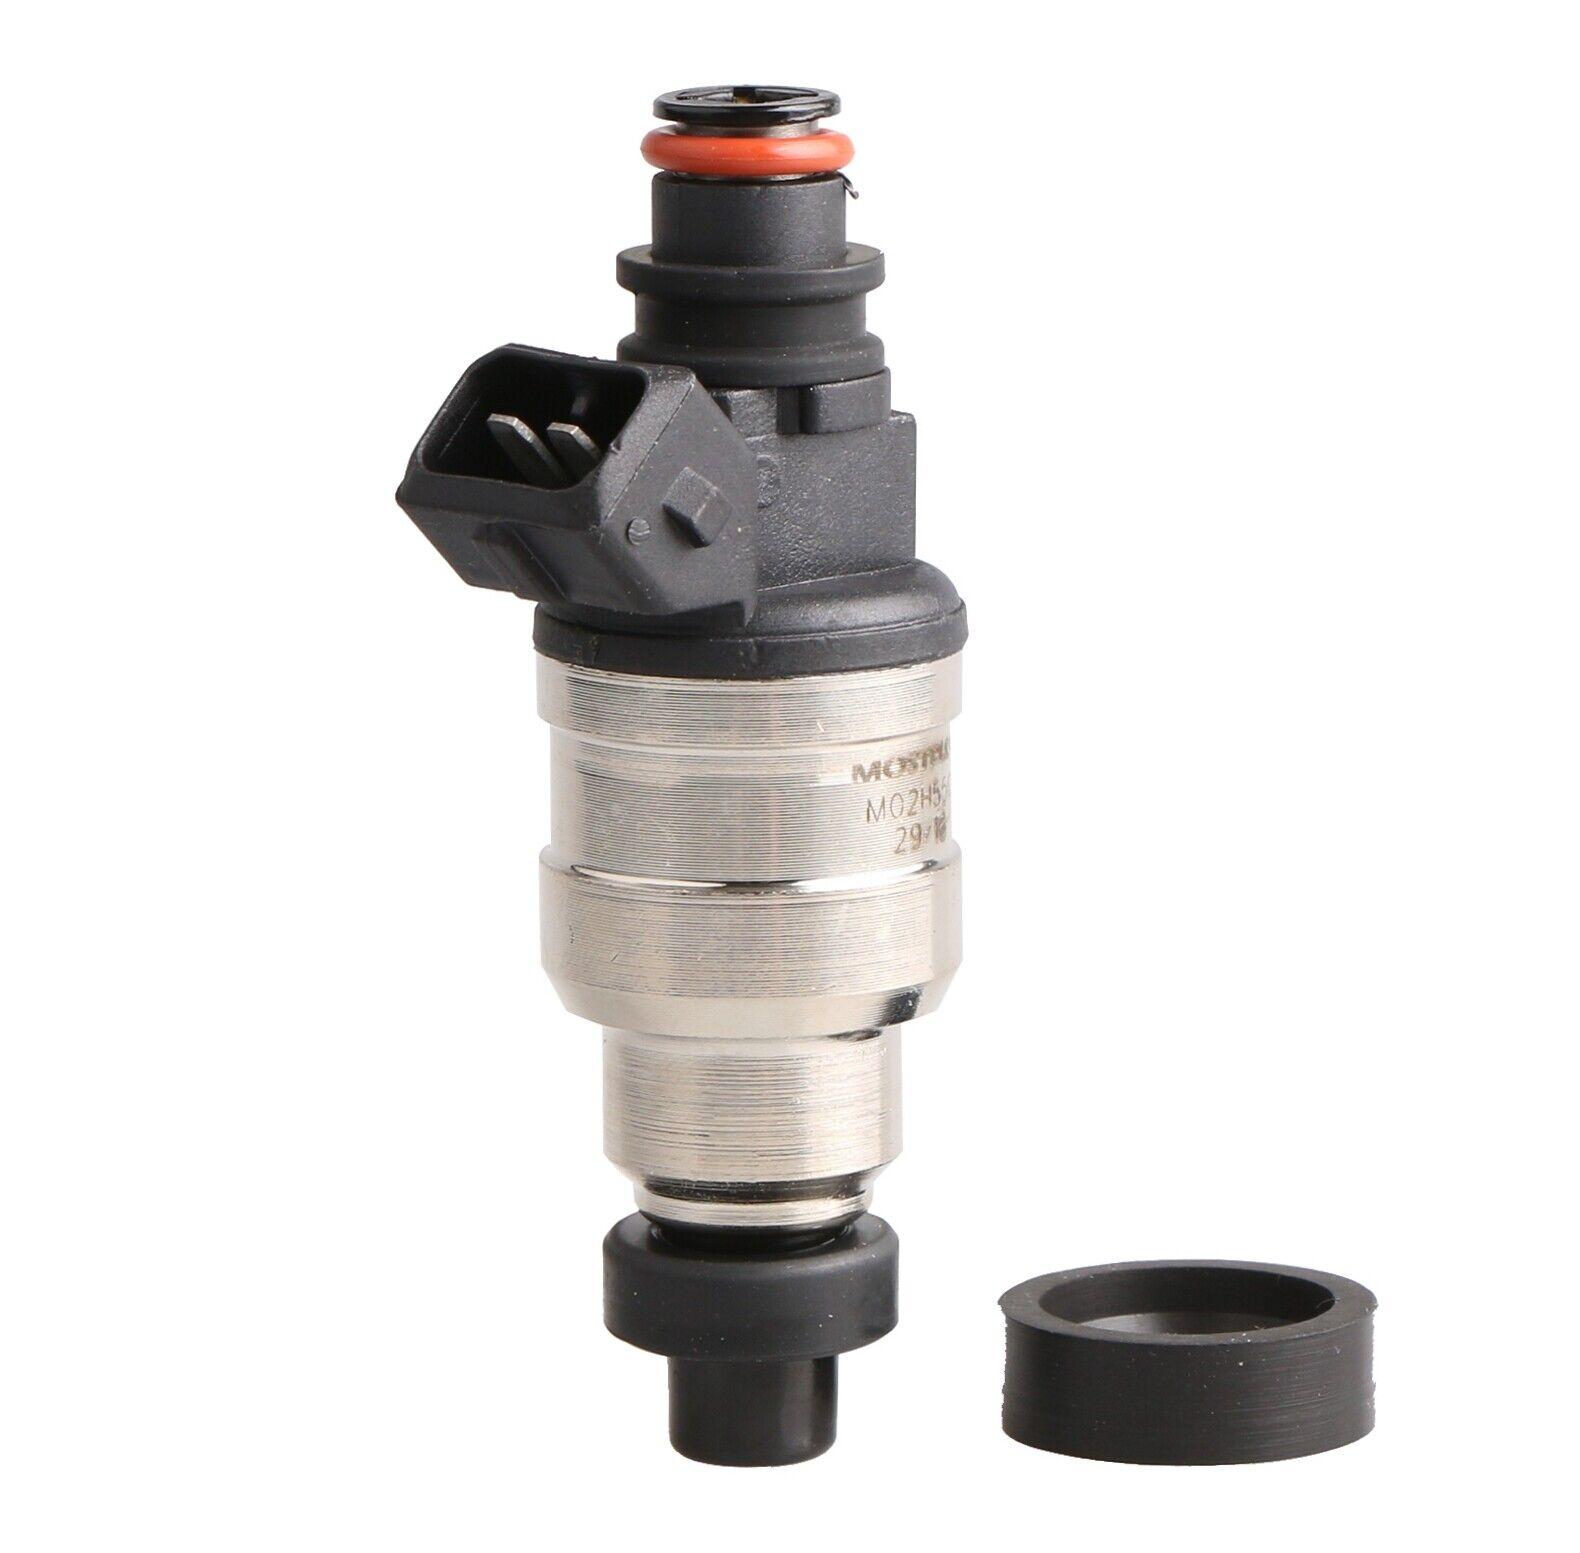 Details about Set of 6 550cc Fuel Injectors for Toyota 7MGE 7MGTE 1JZ  1JZGTE 2JZ 2JZGE 2JZGTE